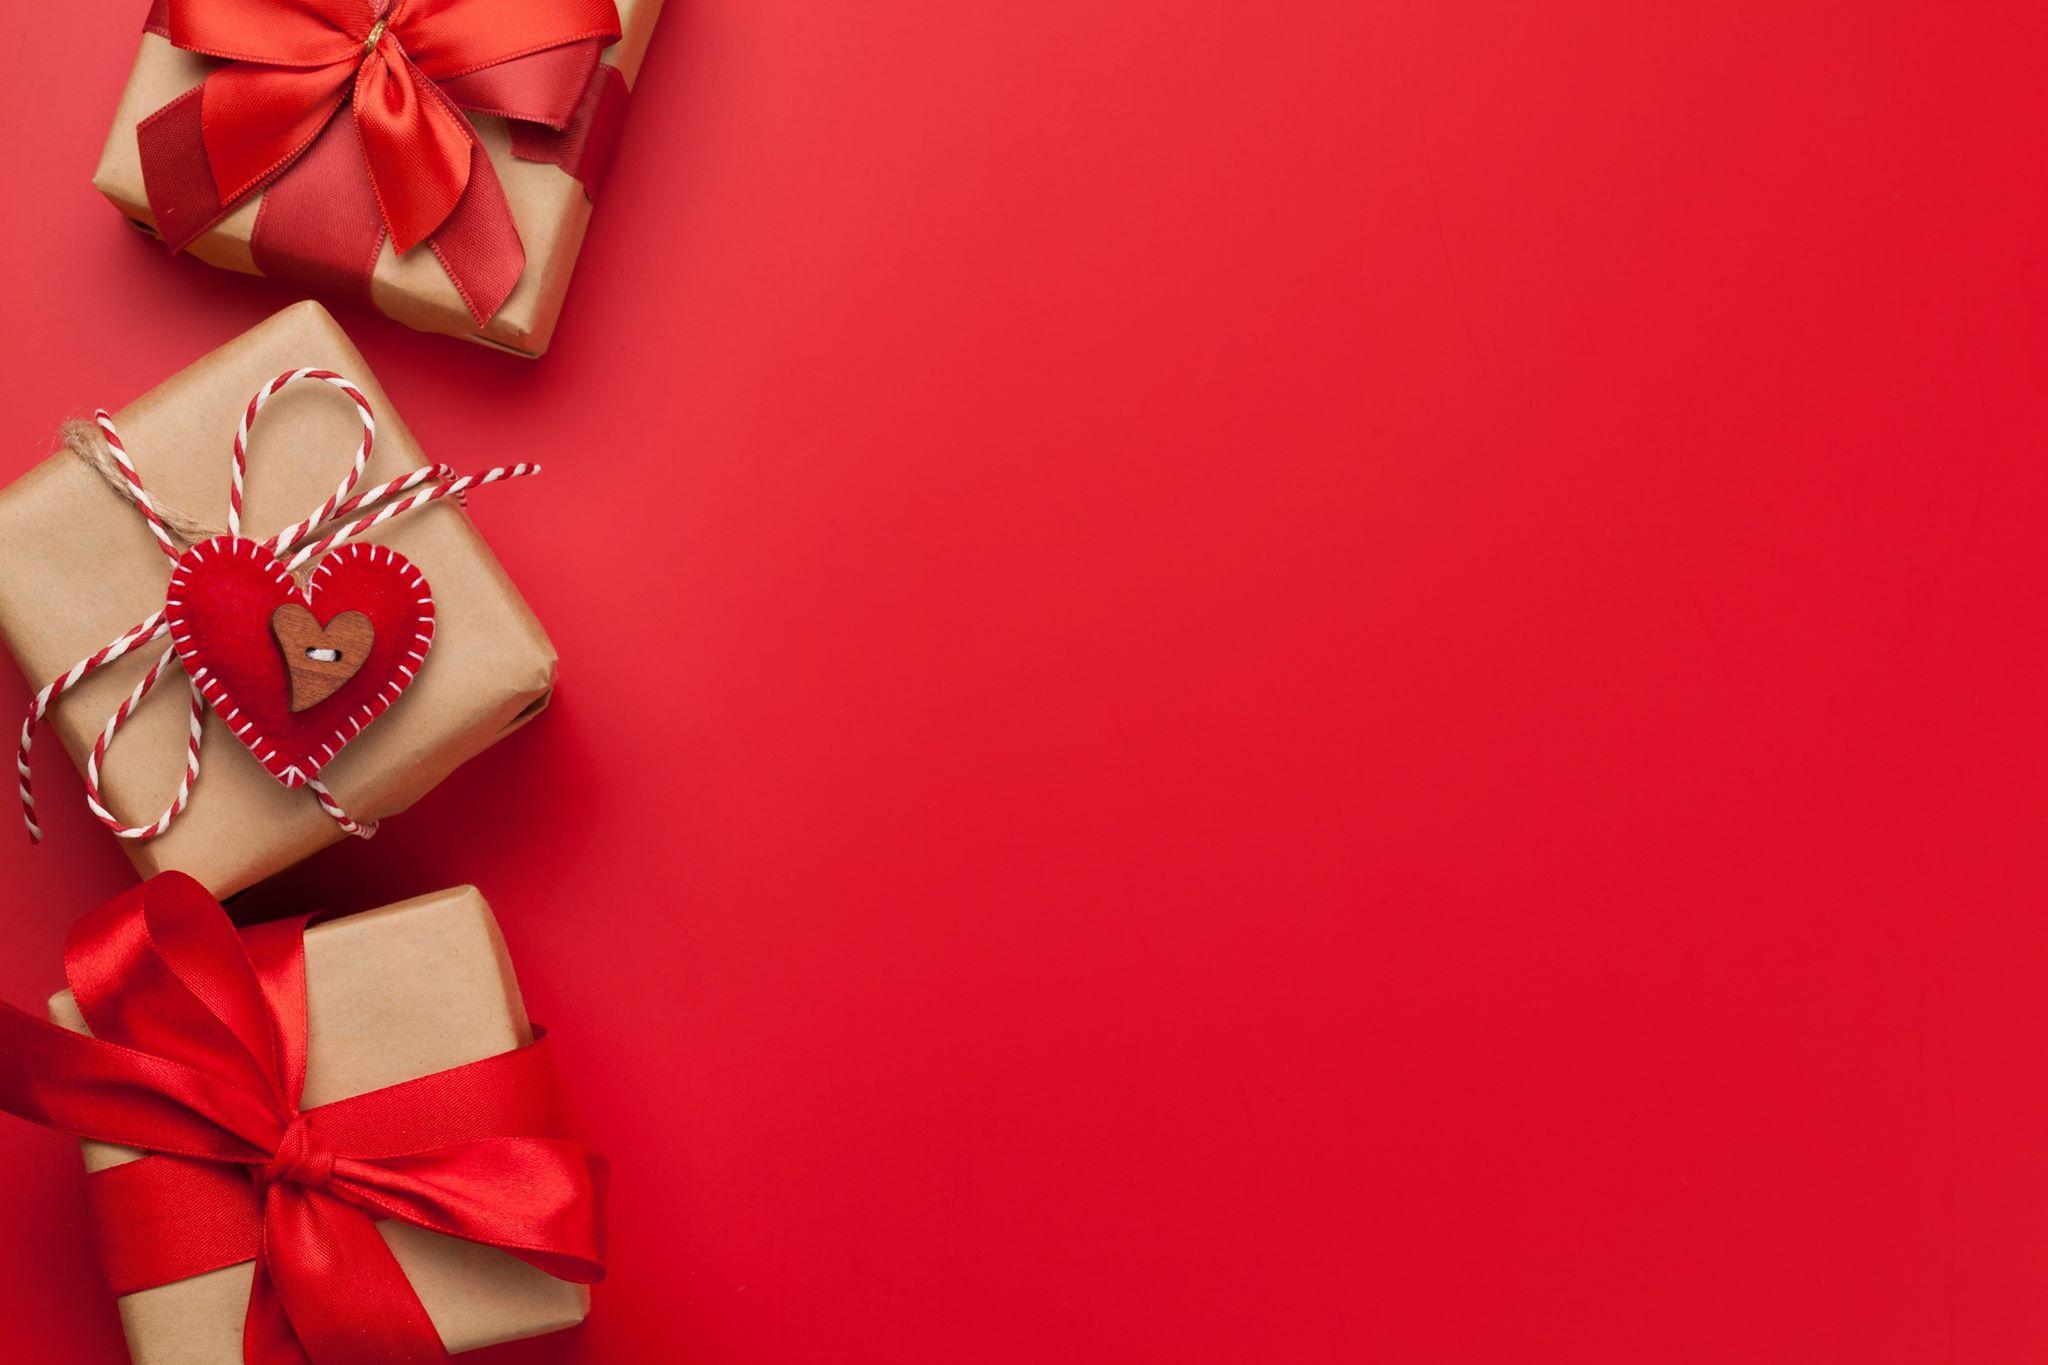 Valentines day images 29 صور عيد الحب